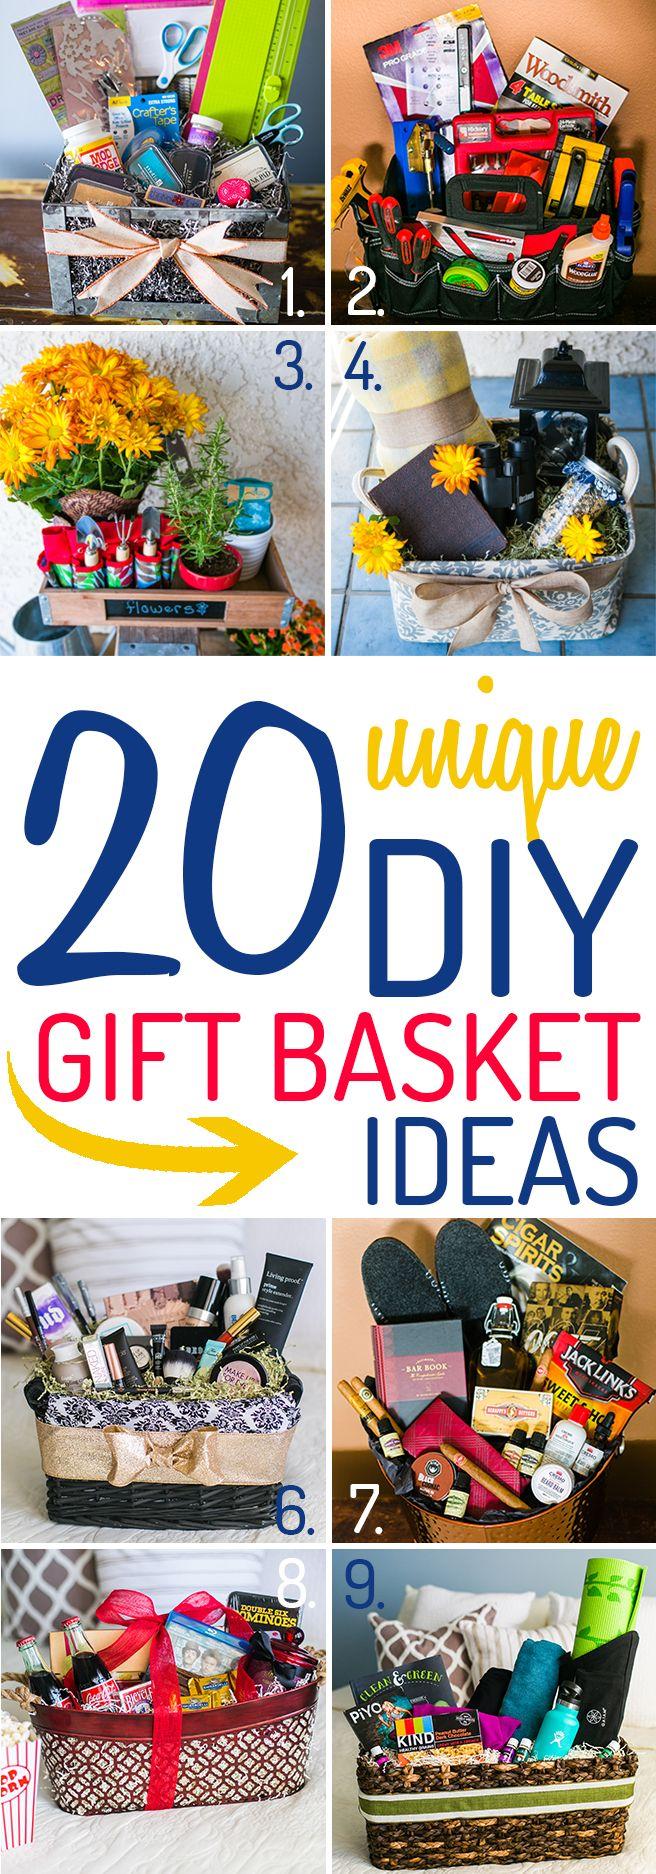 20 Unique DIY Gift Basket Ideas